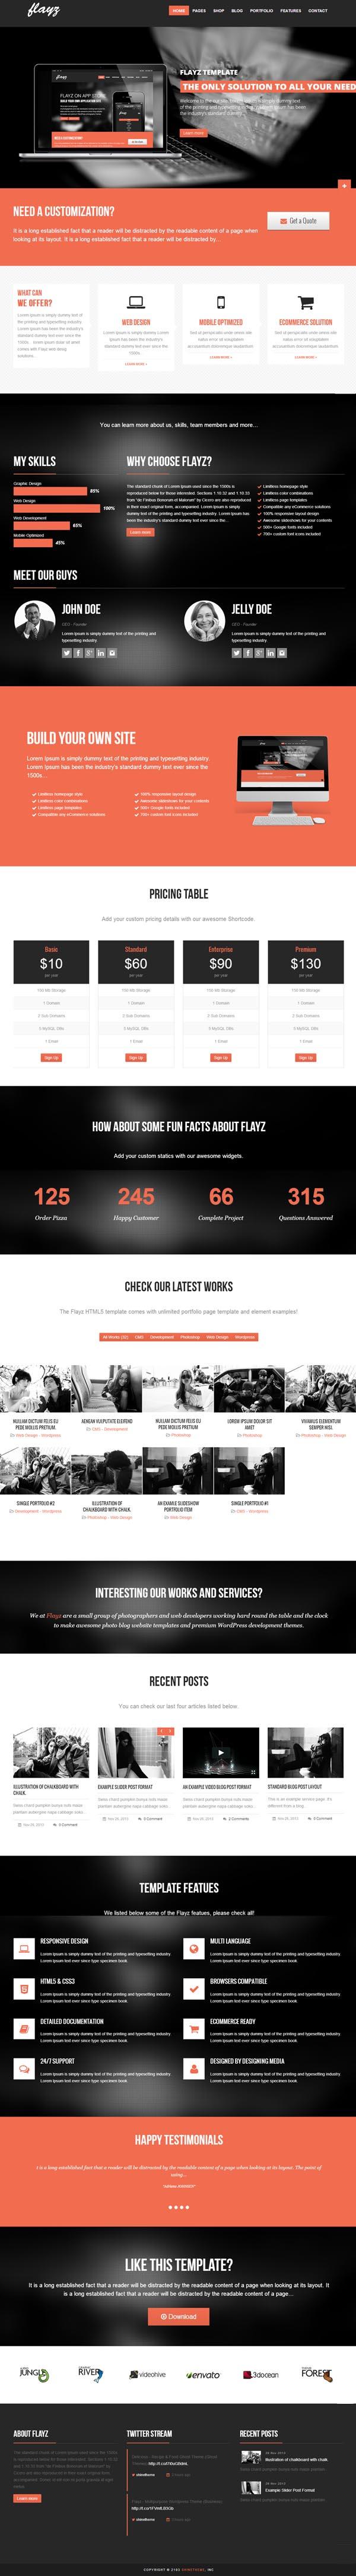 Flayz - Multipurpose WordPress Theme